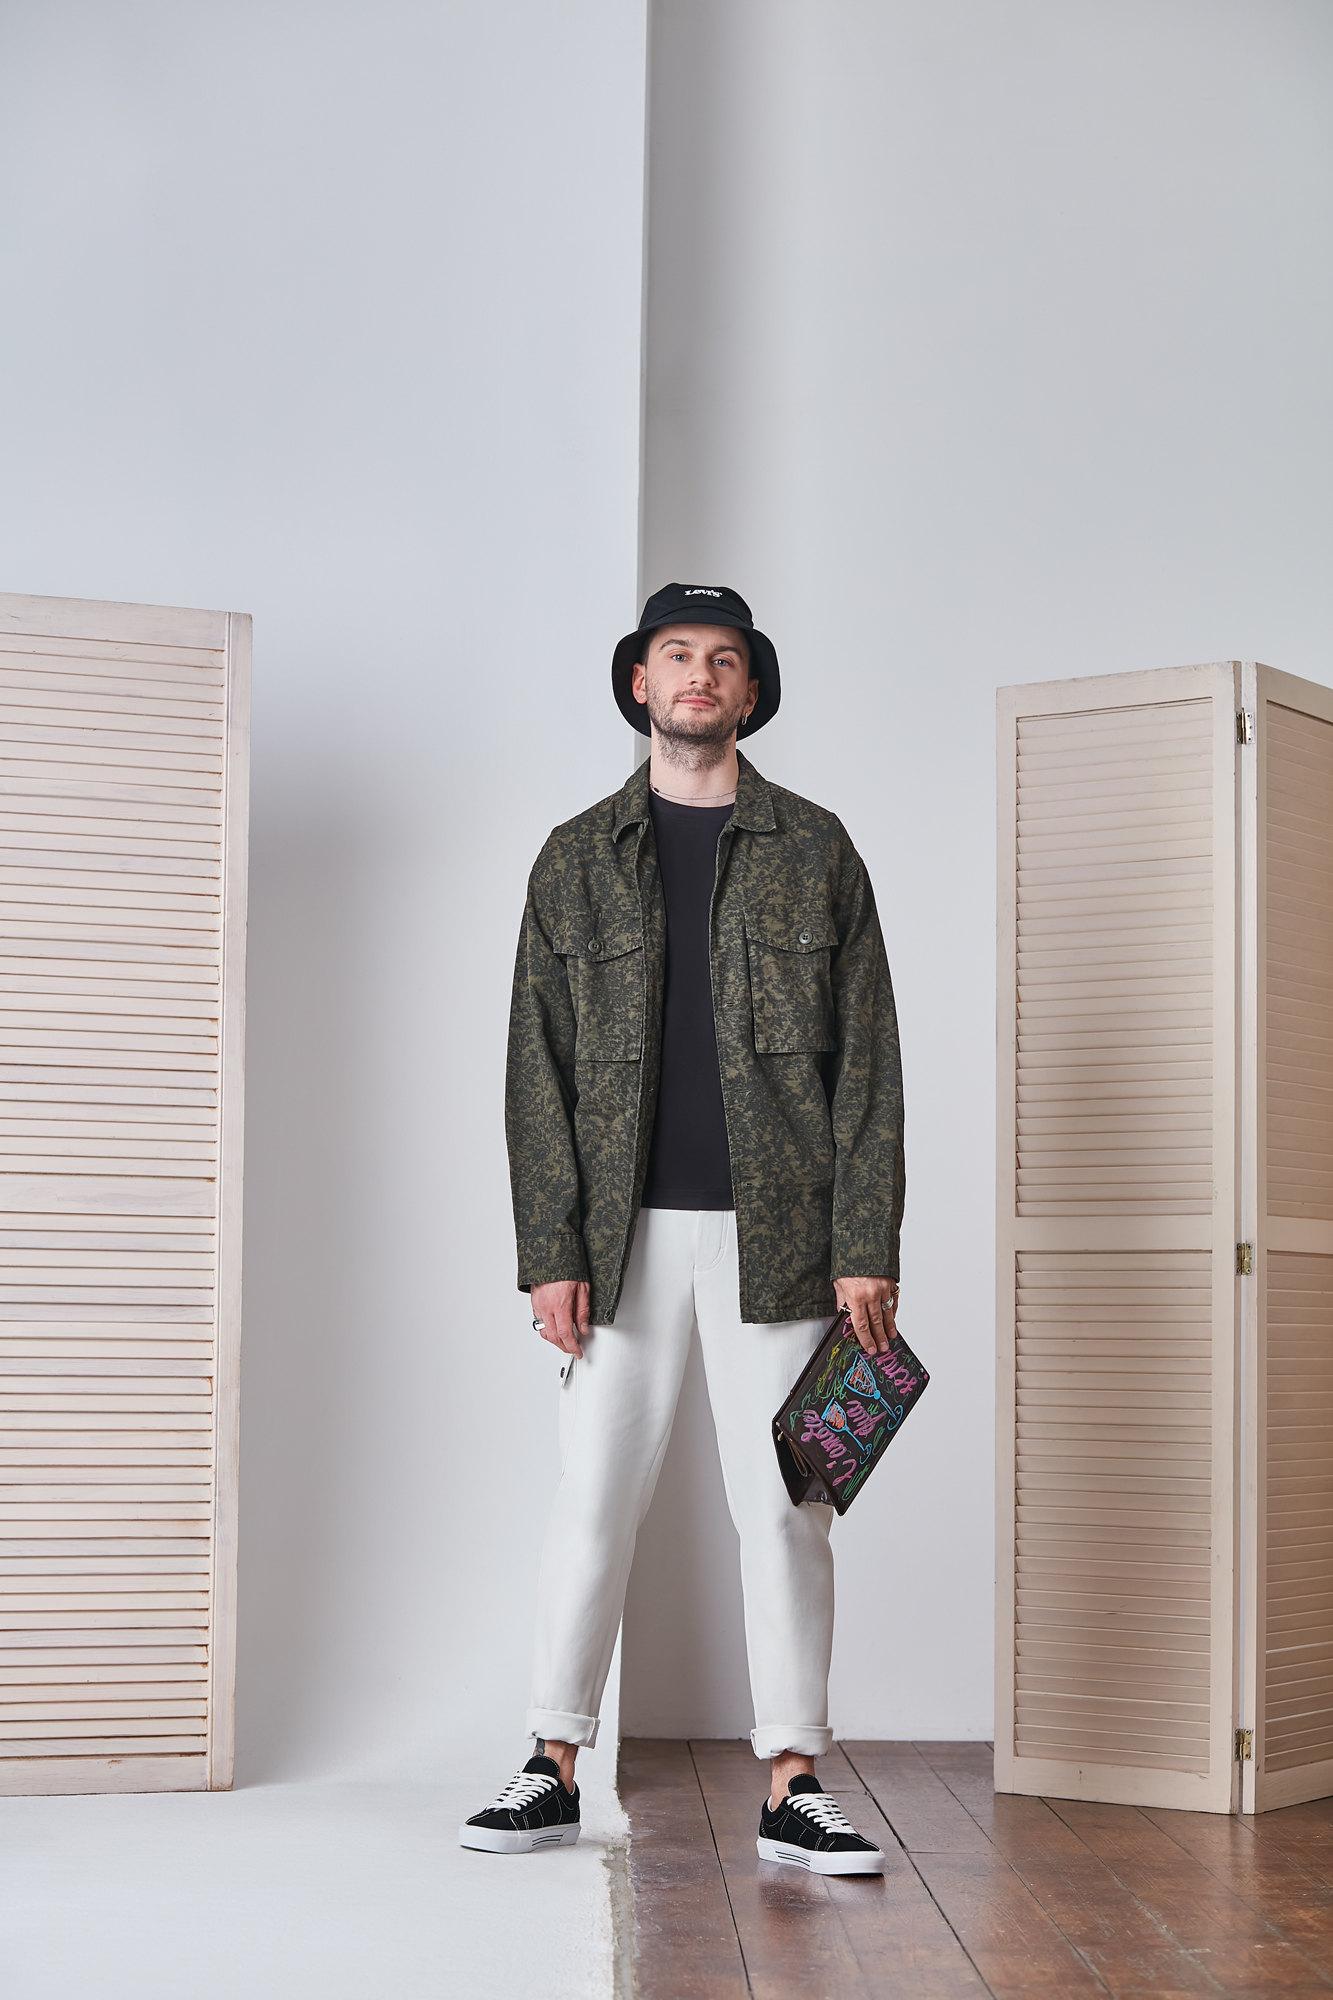 Панама Levi's Куртка Levi'sФутболка Boggi Milano  Брюки BossКлатч, собственность АлександраКеды Vans